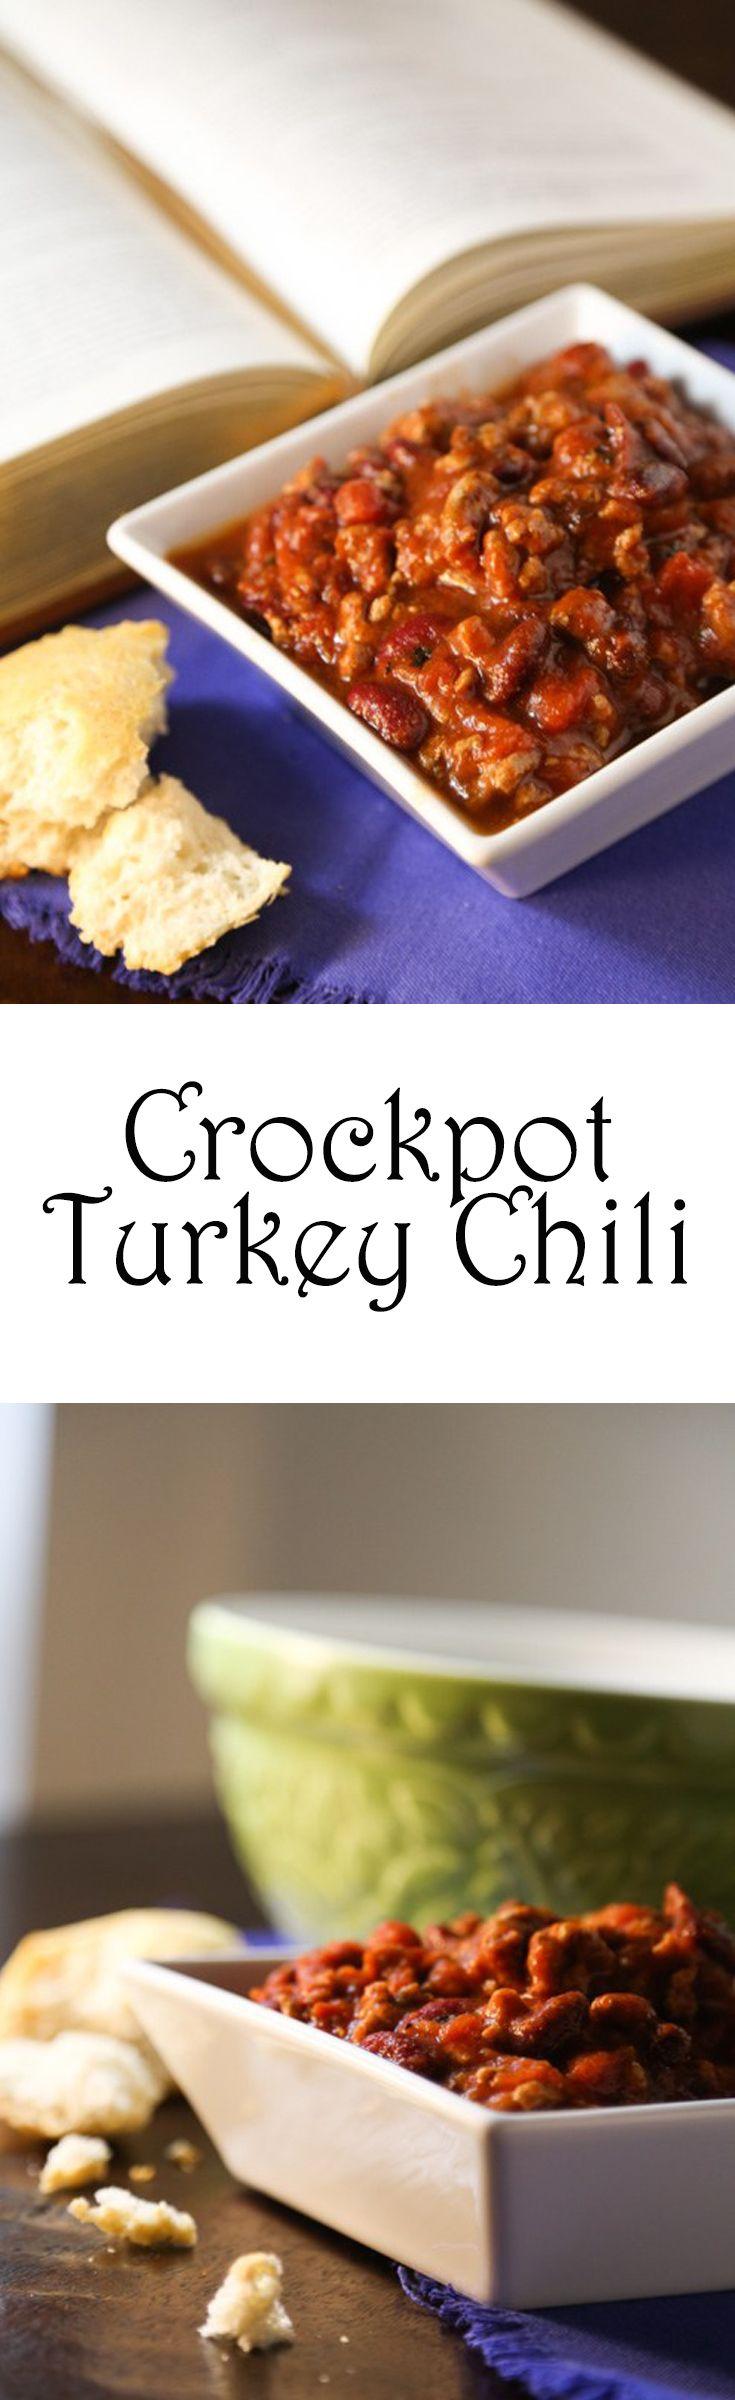 Crockpot Turkey Chili - Lowfat, high protein, low carb